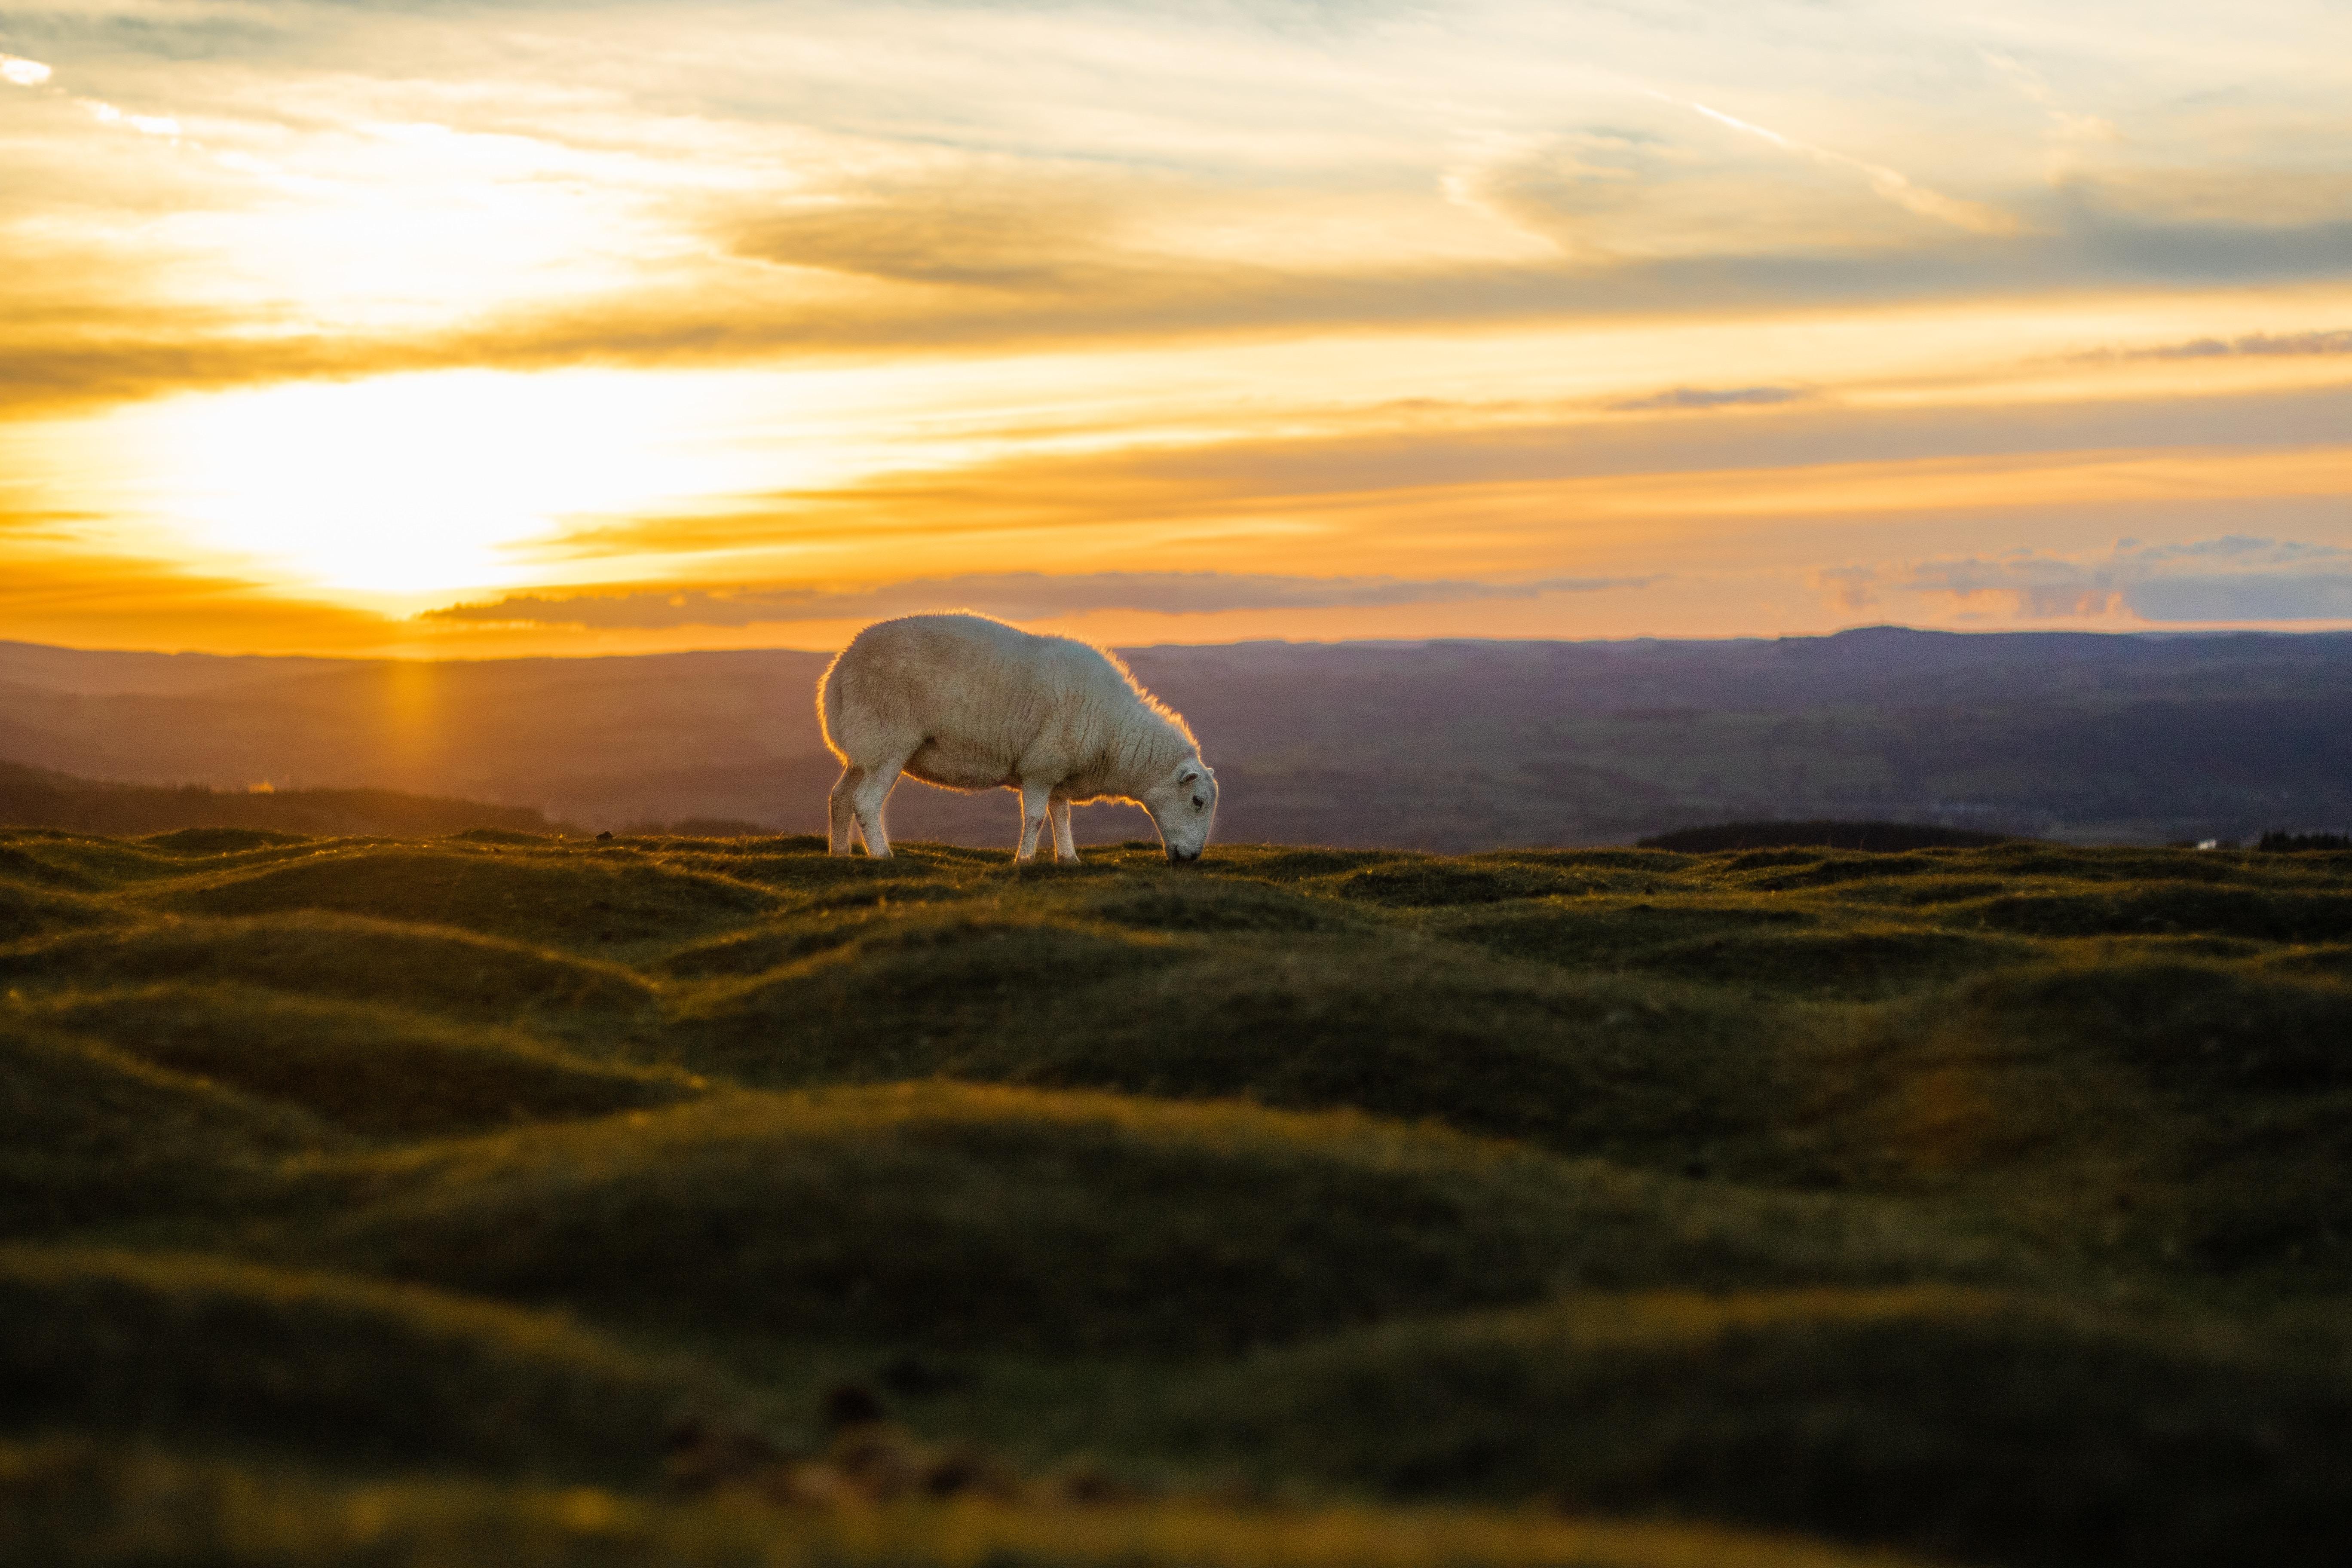 white sheep eating grass